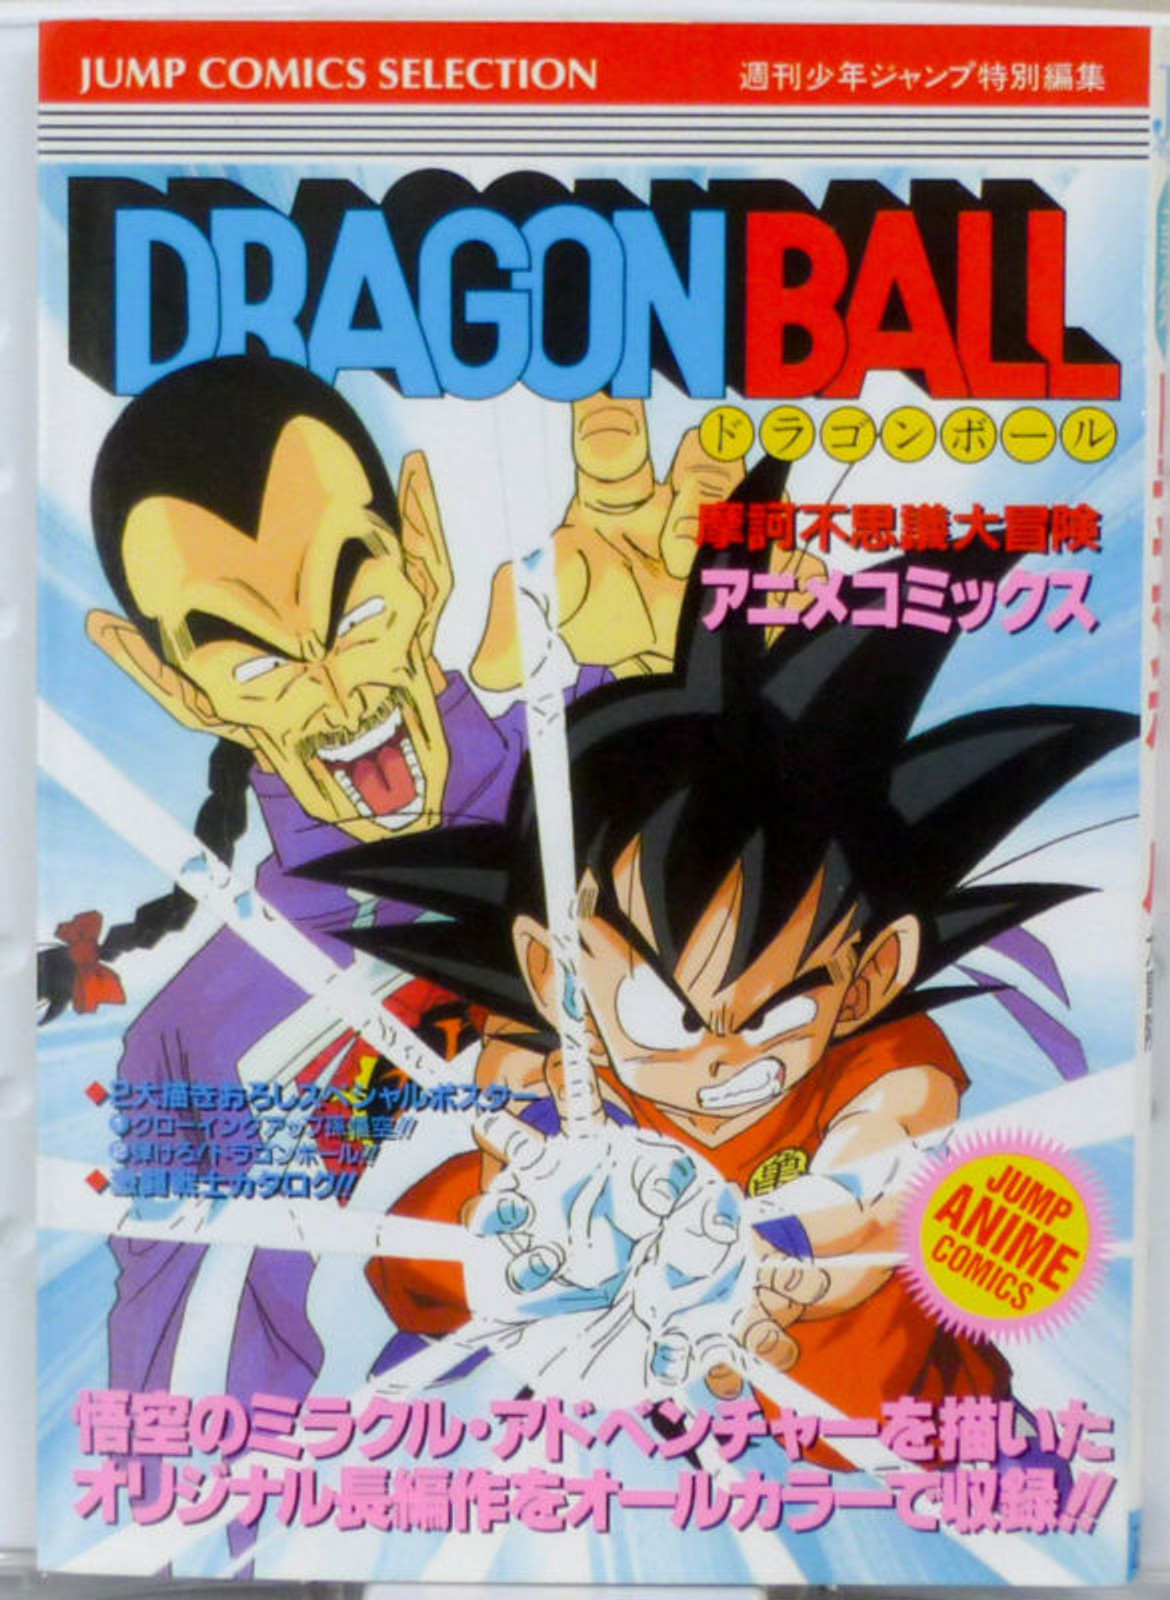 Dragon Ball Z Anime Movie Film Comics Book JAPAN ANIME MANGA 4